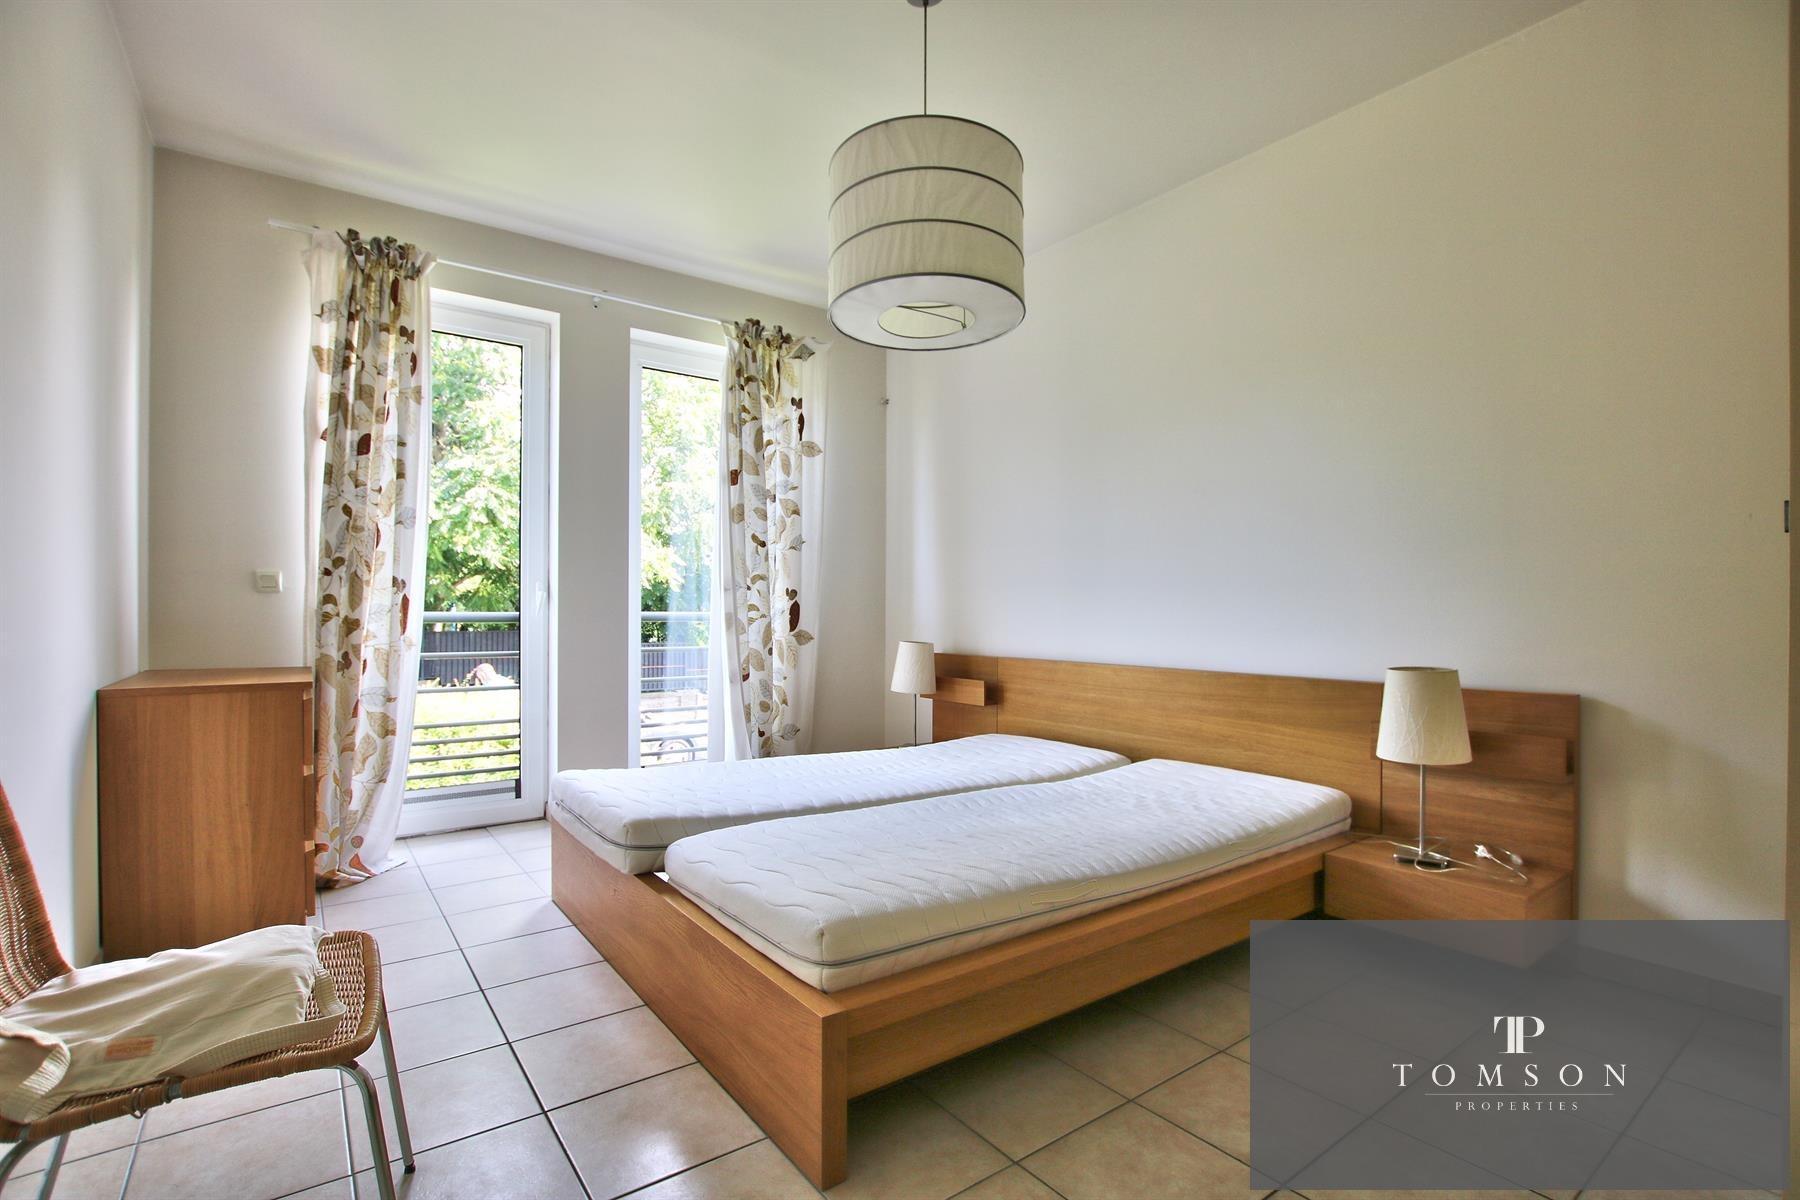 Appartement - Woluwe-Saint-Lambert - #4444905-7